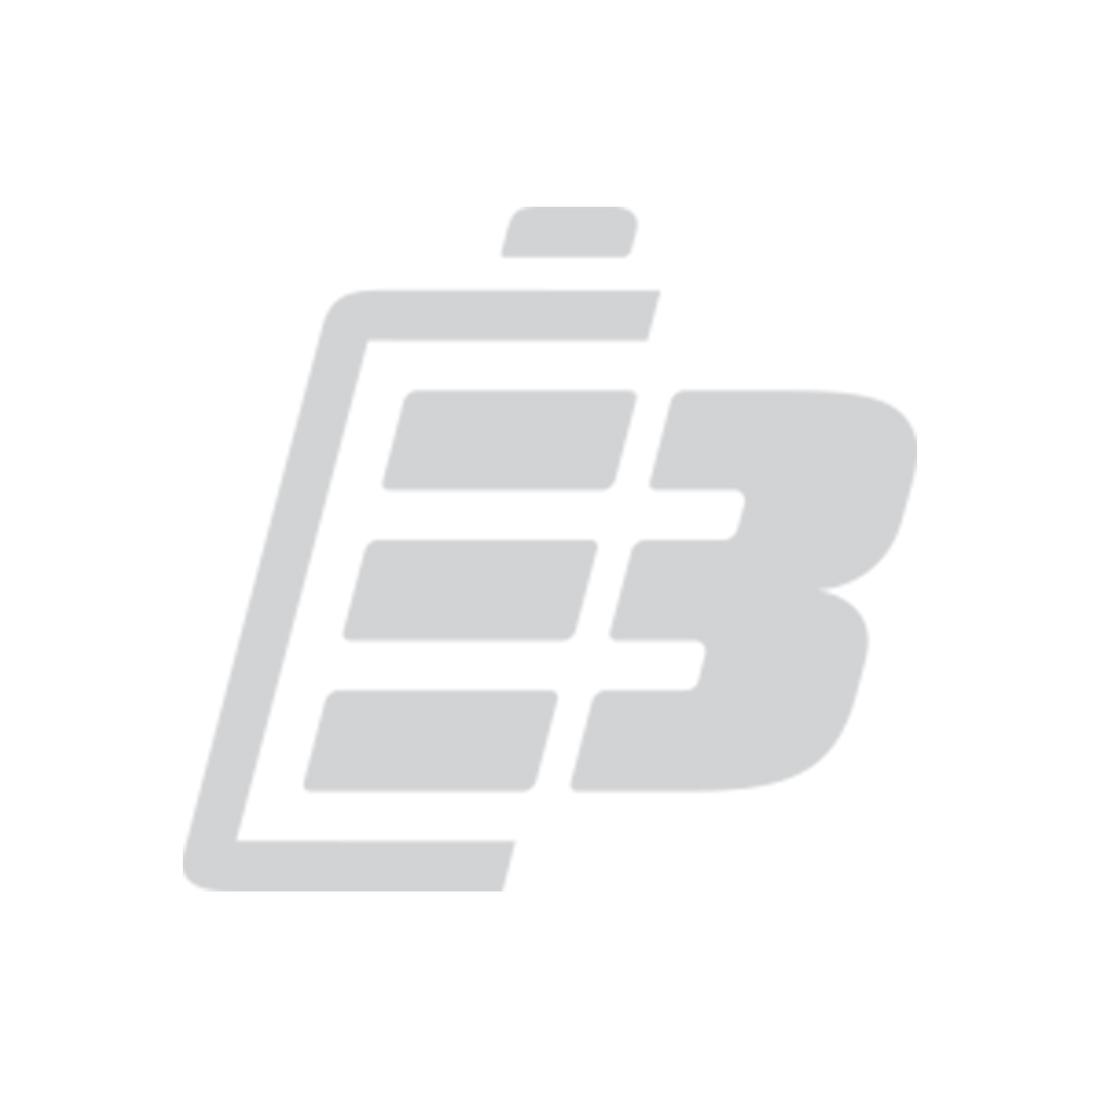 Efan NC1 1-bay USB Charger